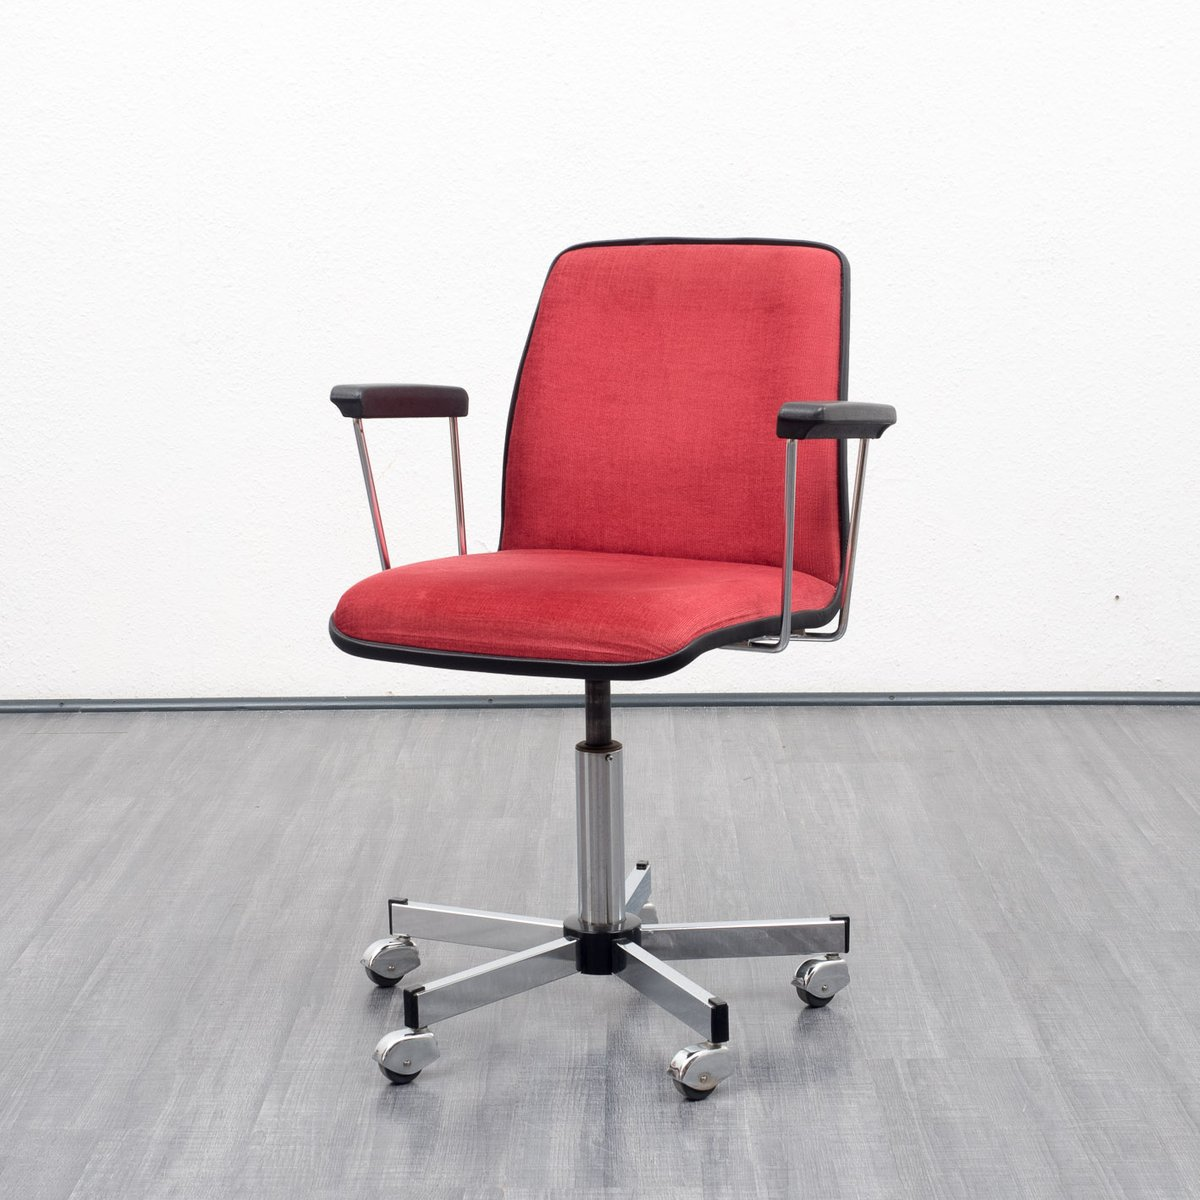 velvet office chair 1960s for sale at pamono. Black Bedroom Furniture Sets. Home Design Ideas